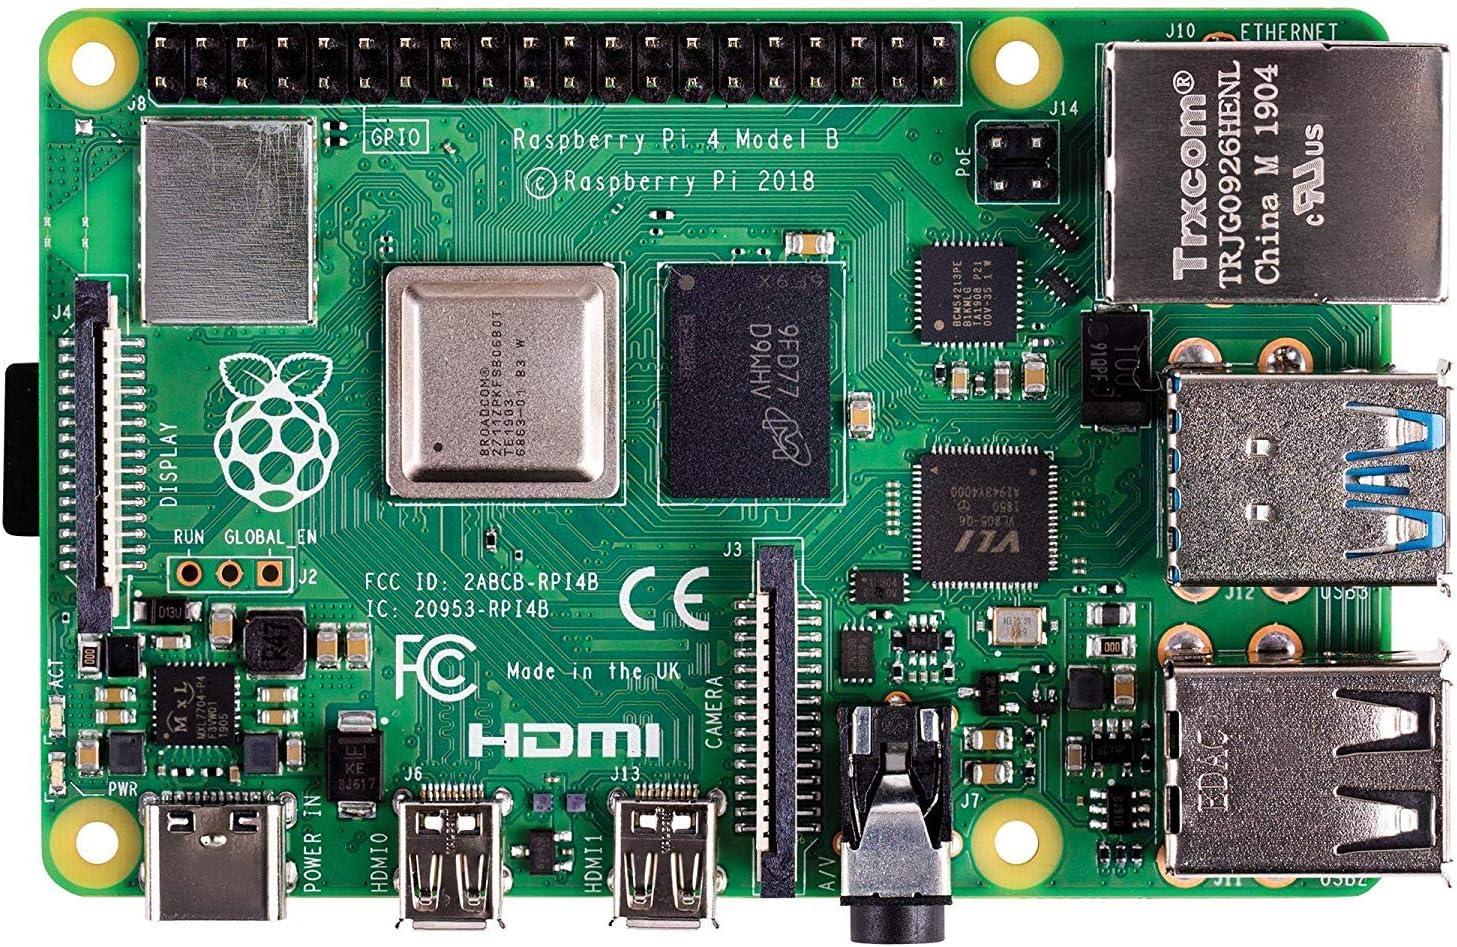 Raspberry Pi 4 Model B 2gb Arm Cortex A72 4x 1 50ghz Computers Accessories